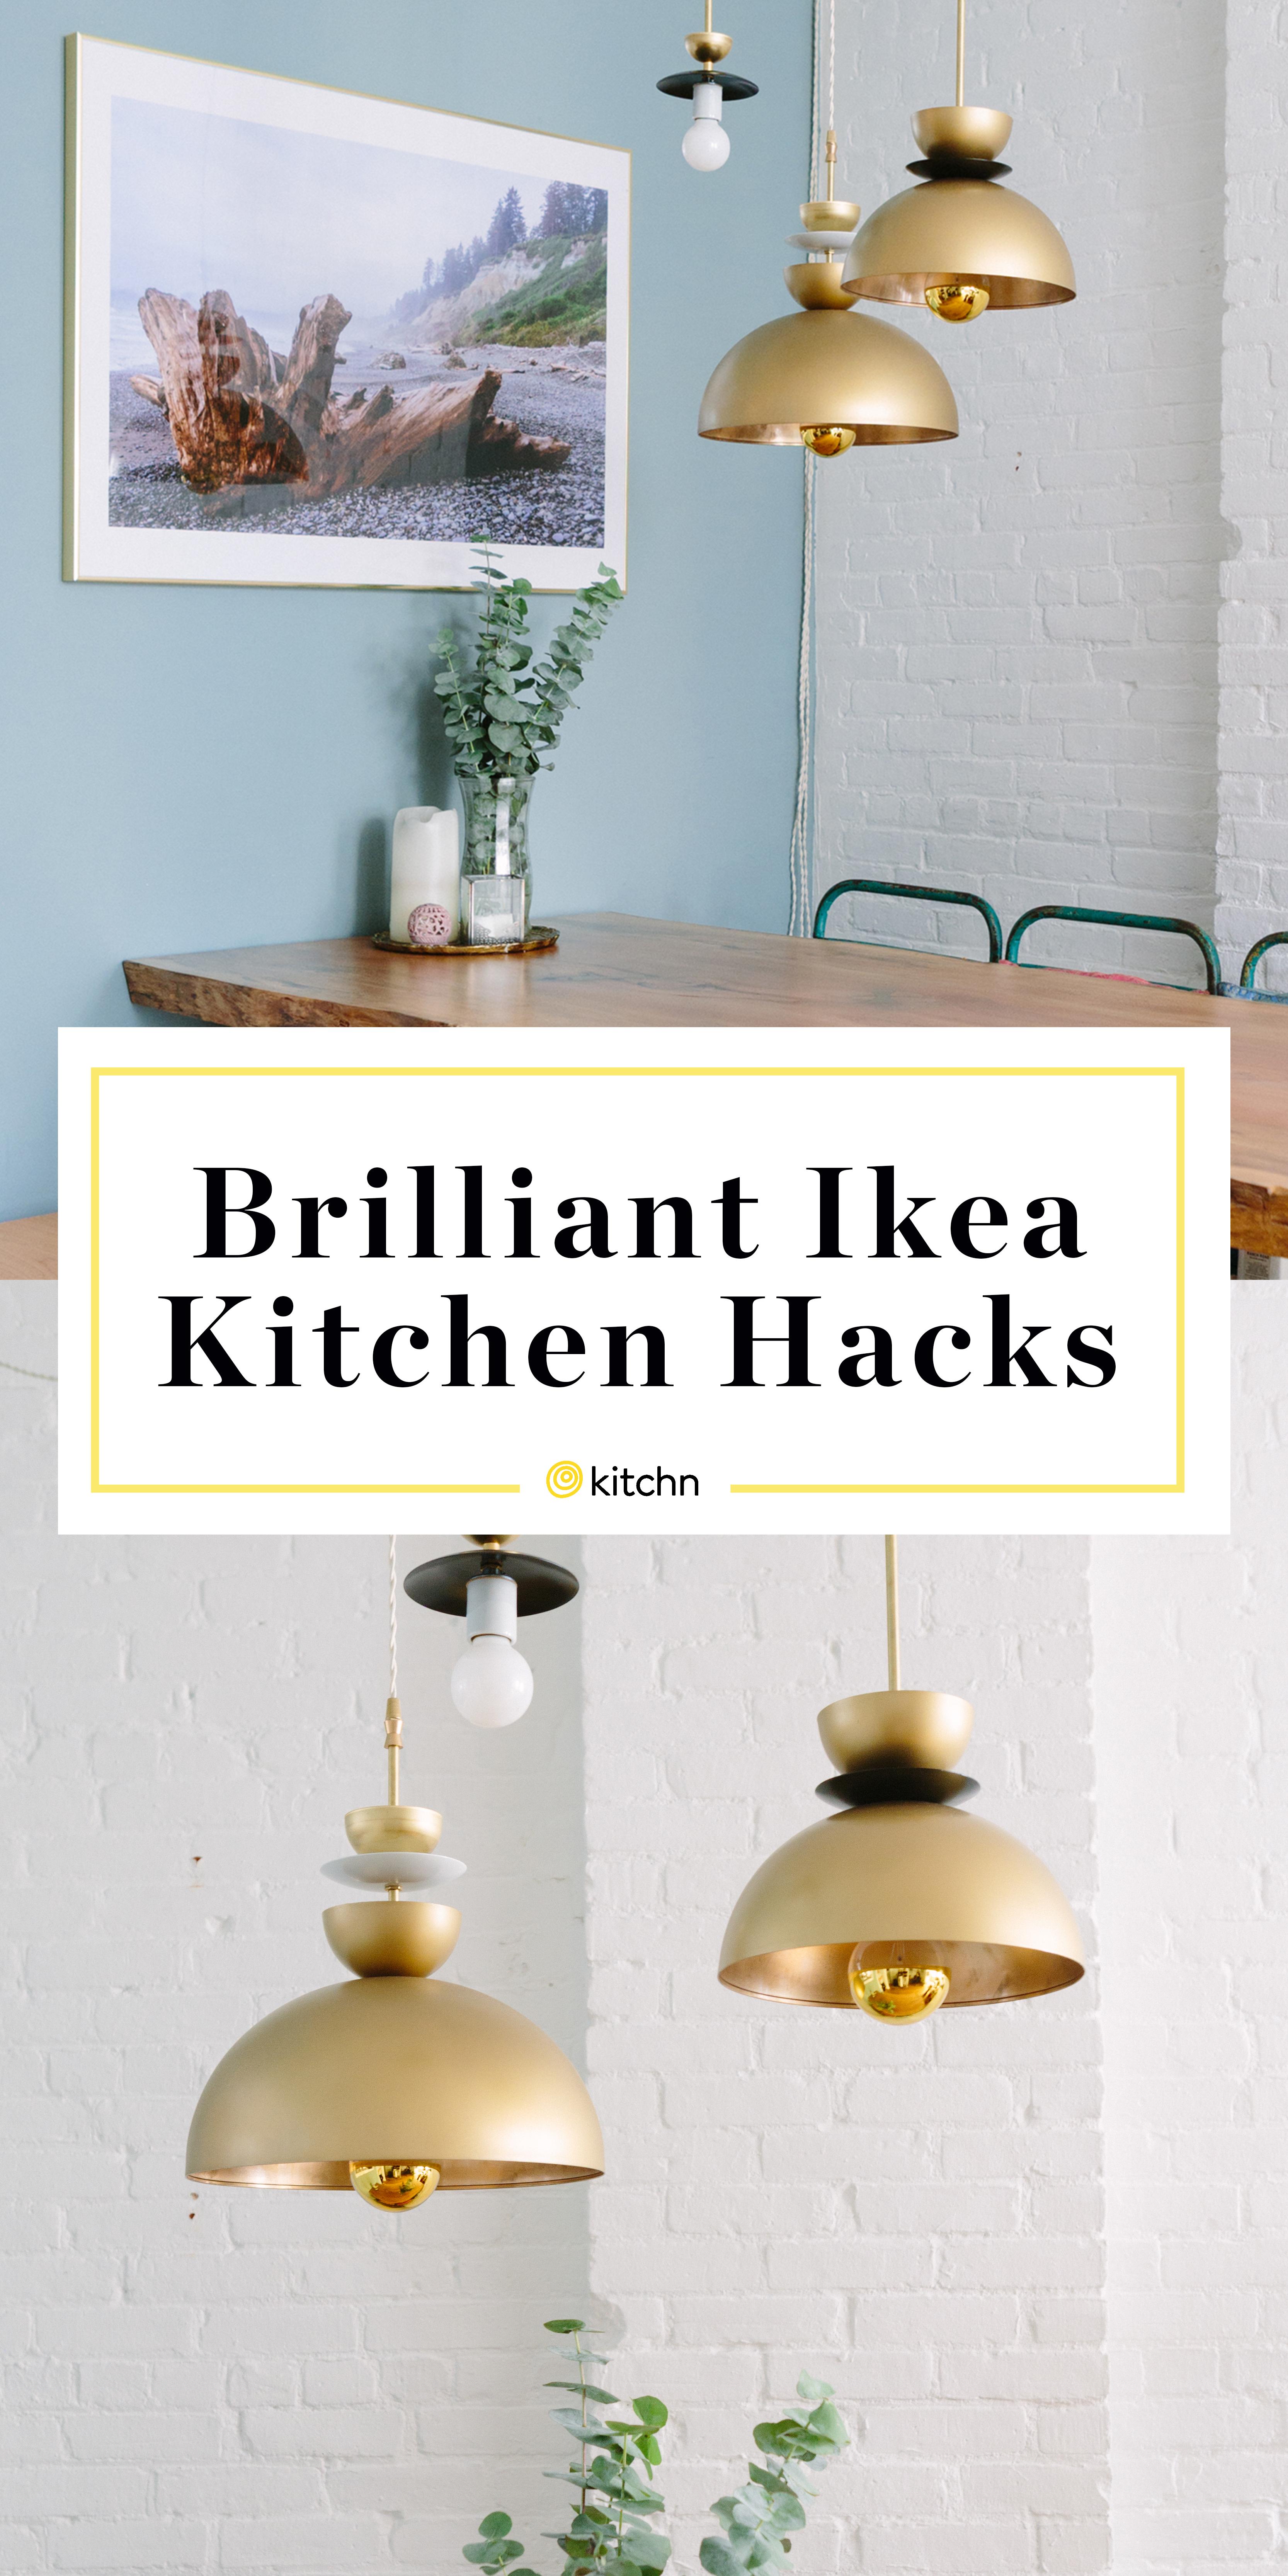 IKEA Kitchen Hacks | Kitchn